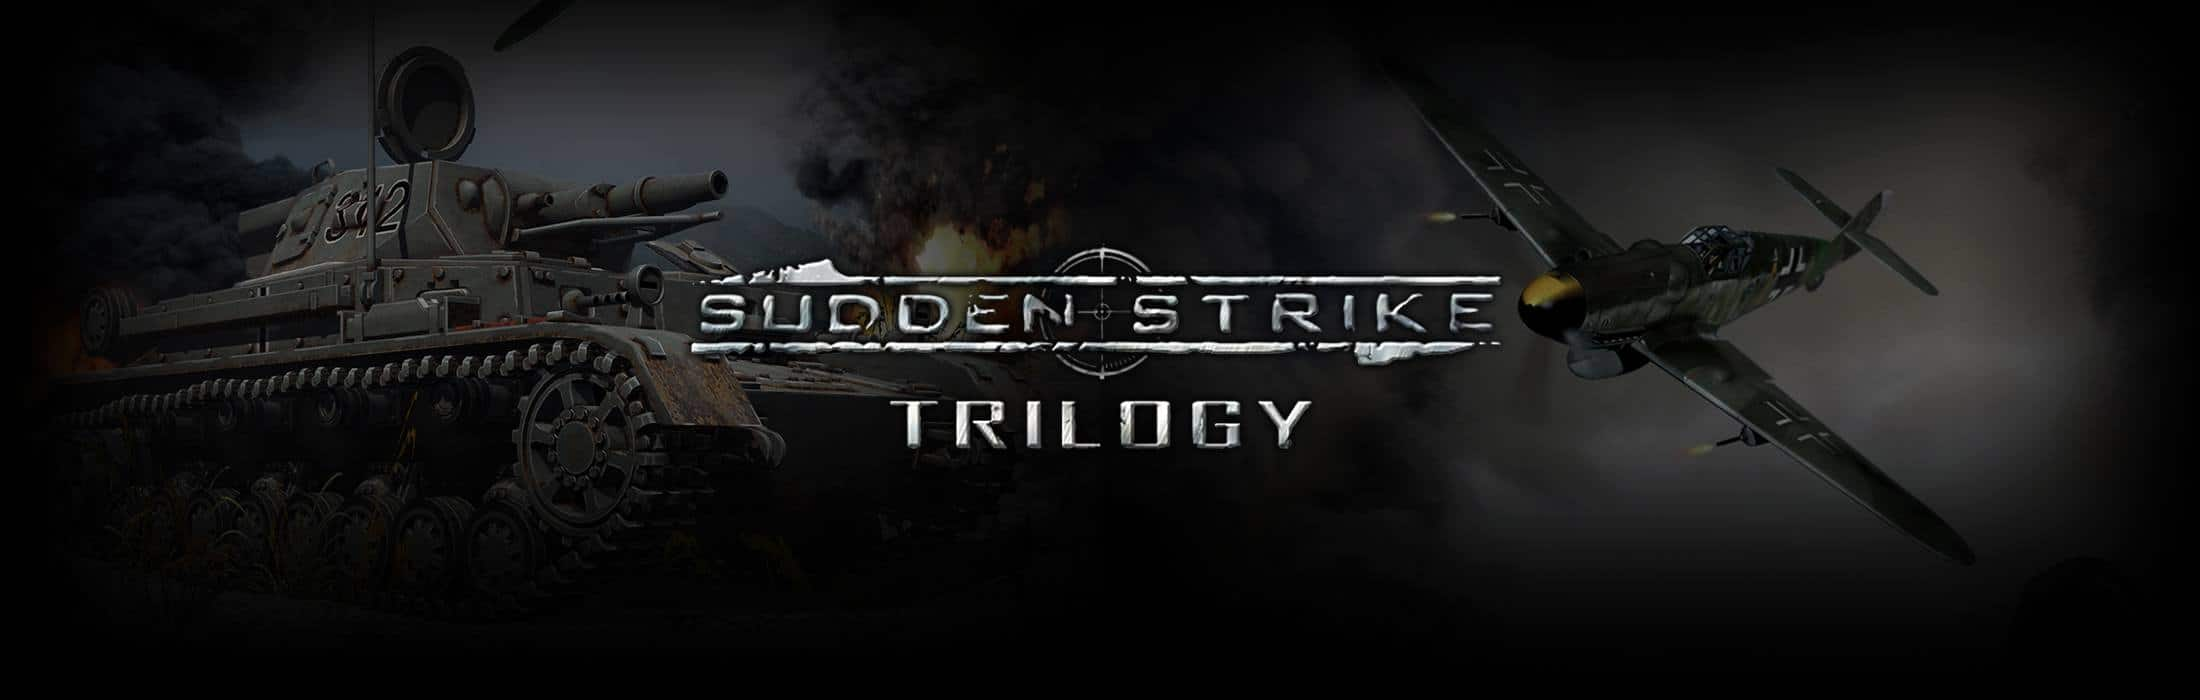 Sudden Strike Trilogy (PC Digital Download) $2.49 @ Fanatical